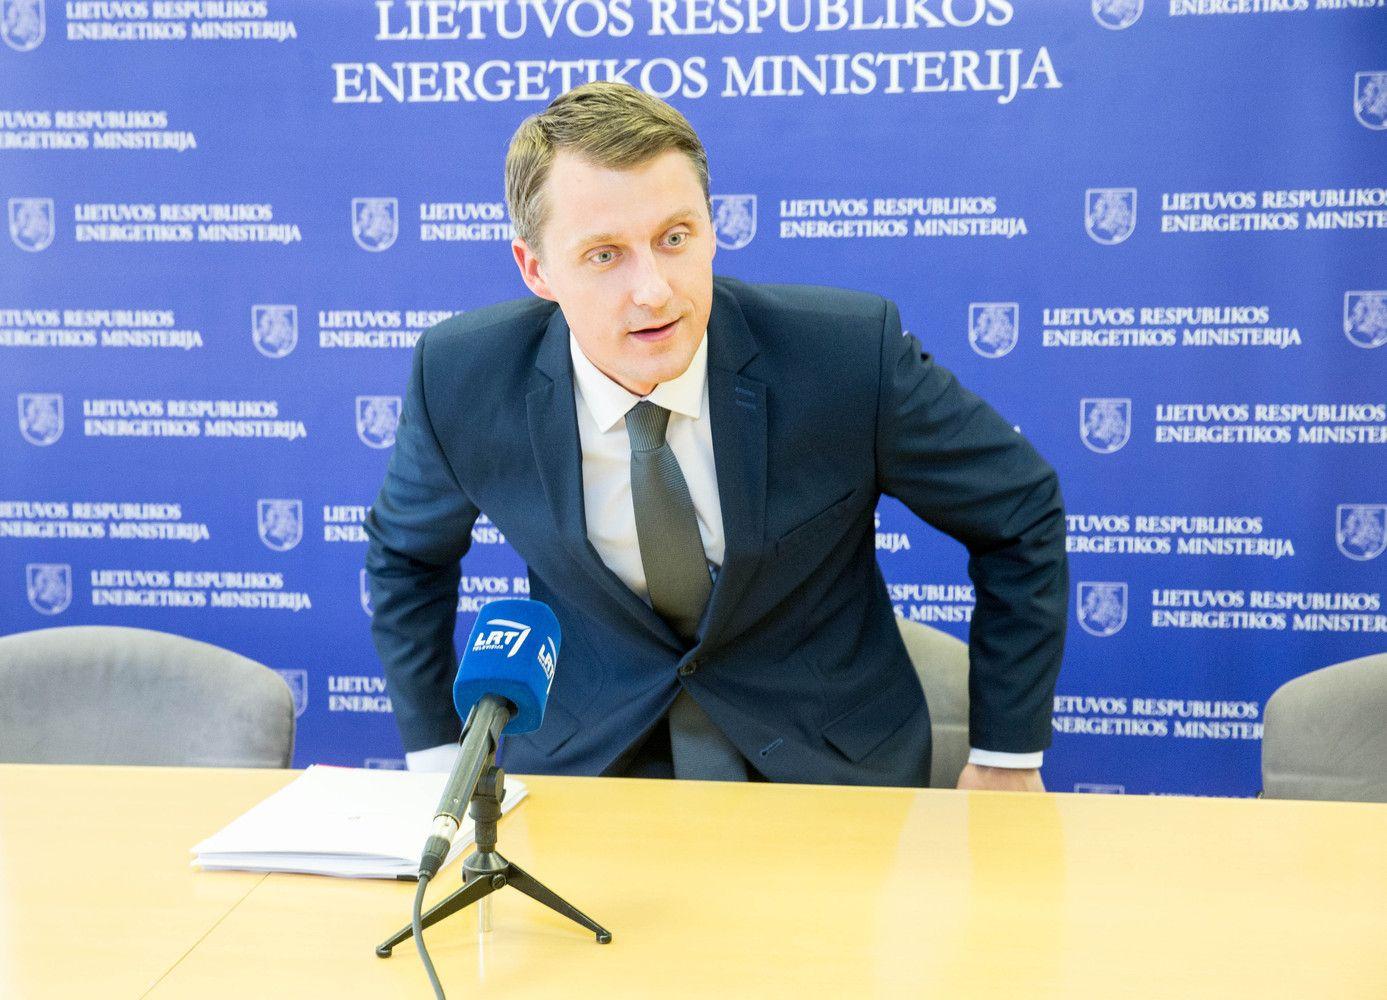 Ūkio ministro portfelis laikinai atiteks energetikos ministrui